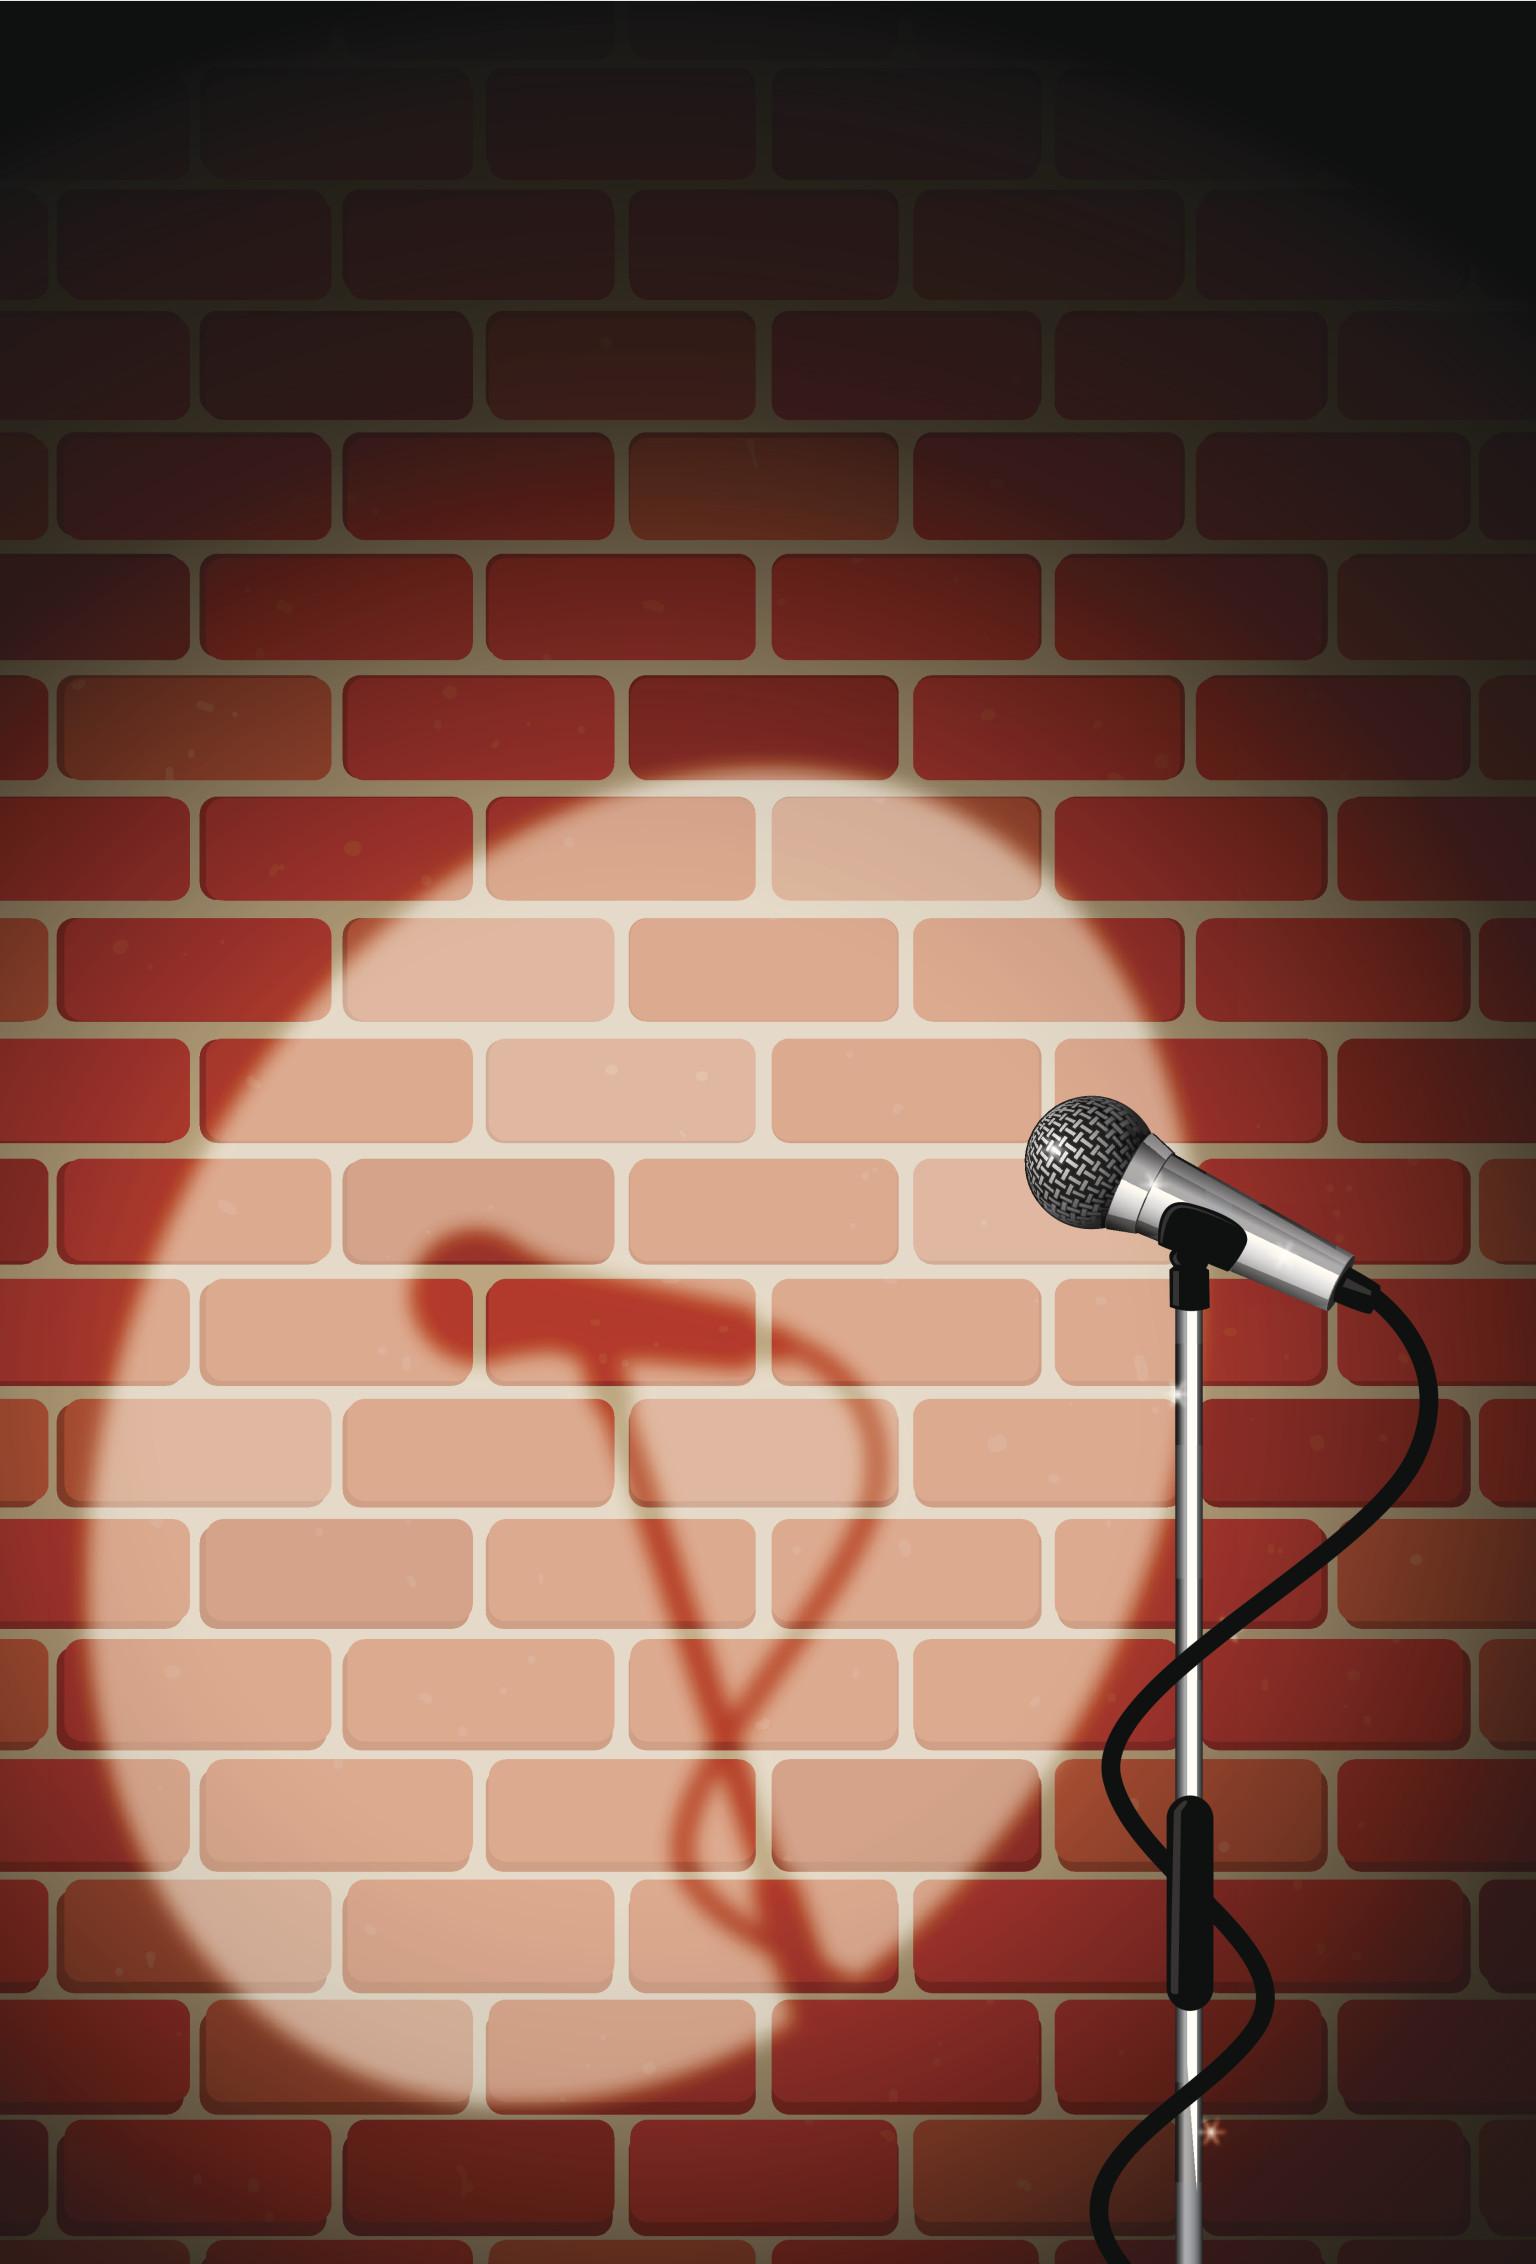 microphone-stand-clip-art